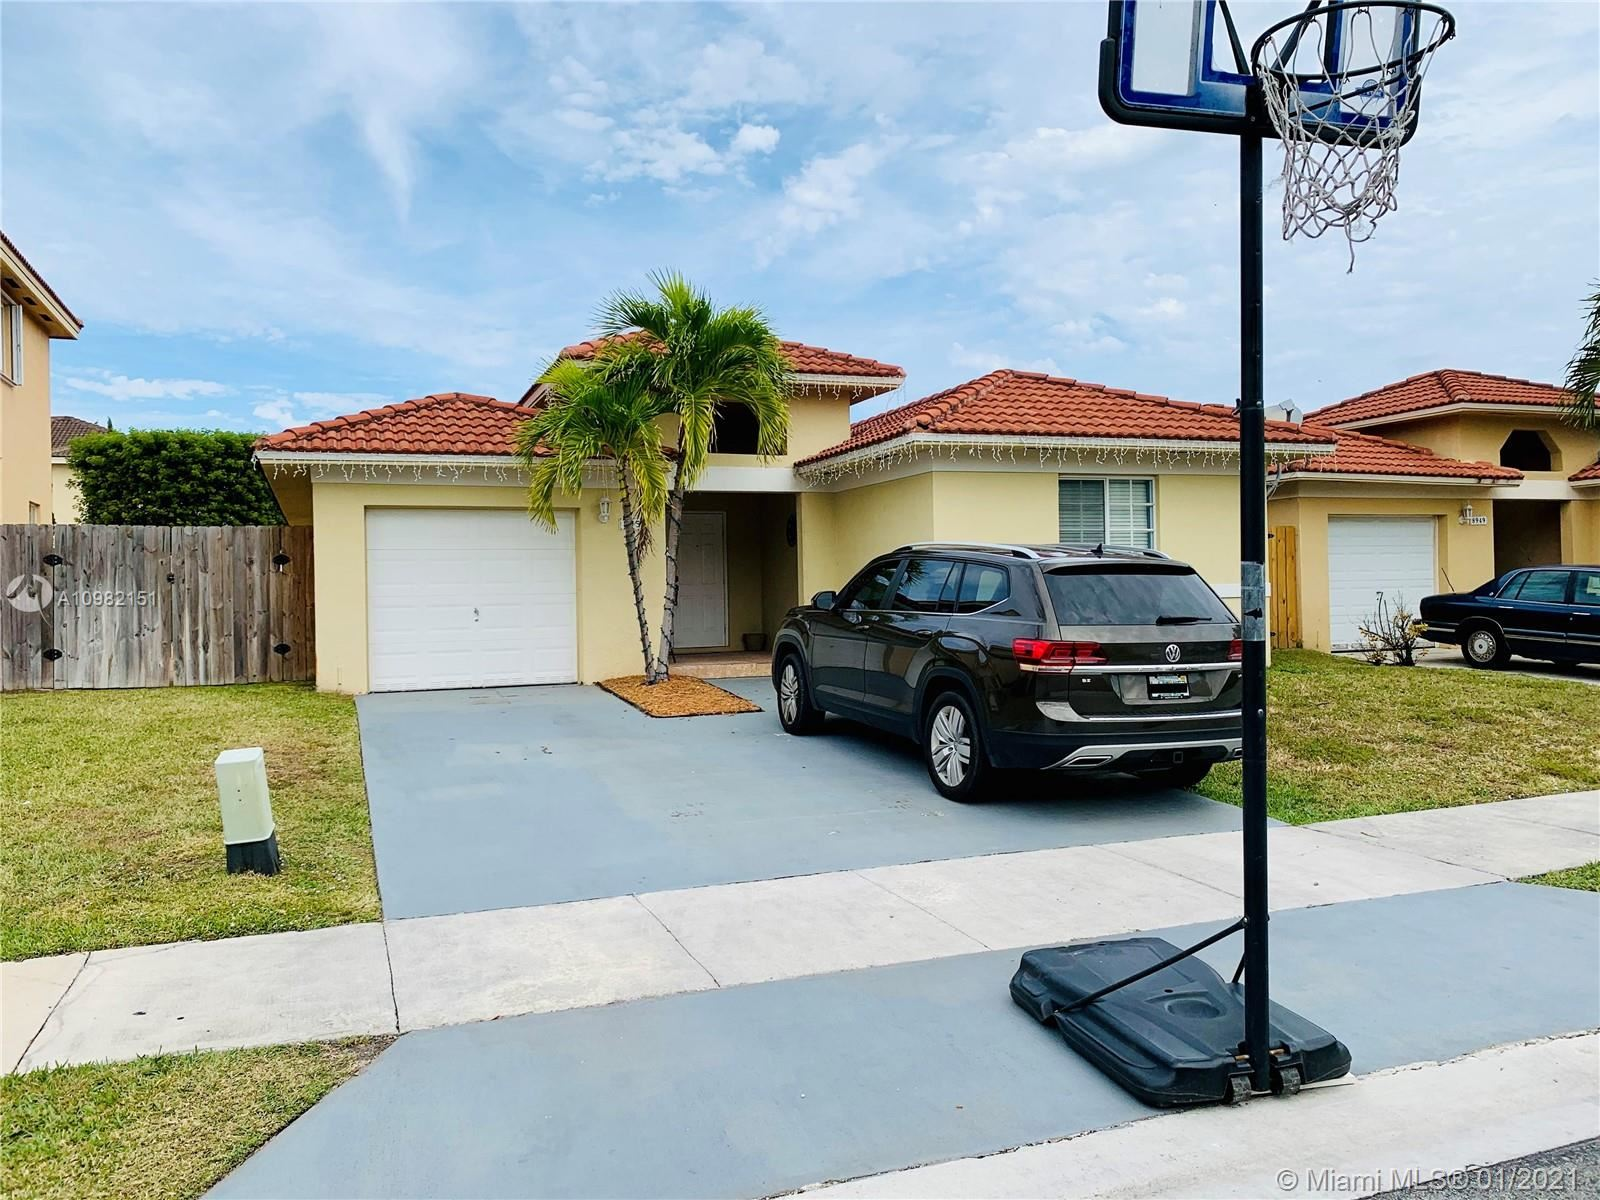 8955 SW 215th Terrace, Cutler Bay, FL 33189 - #: A10982151